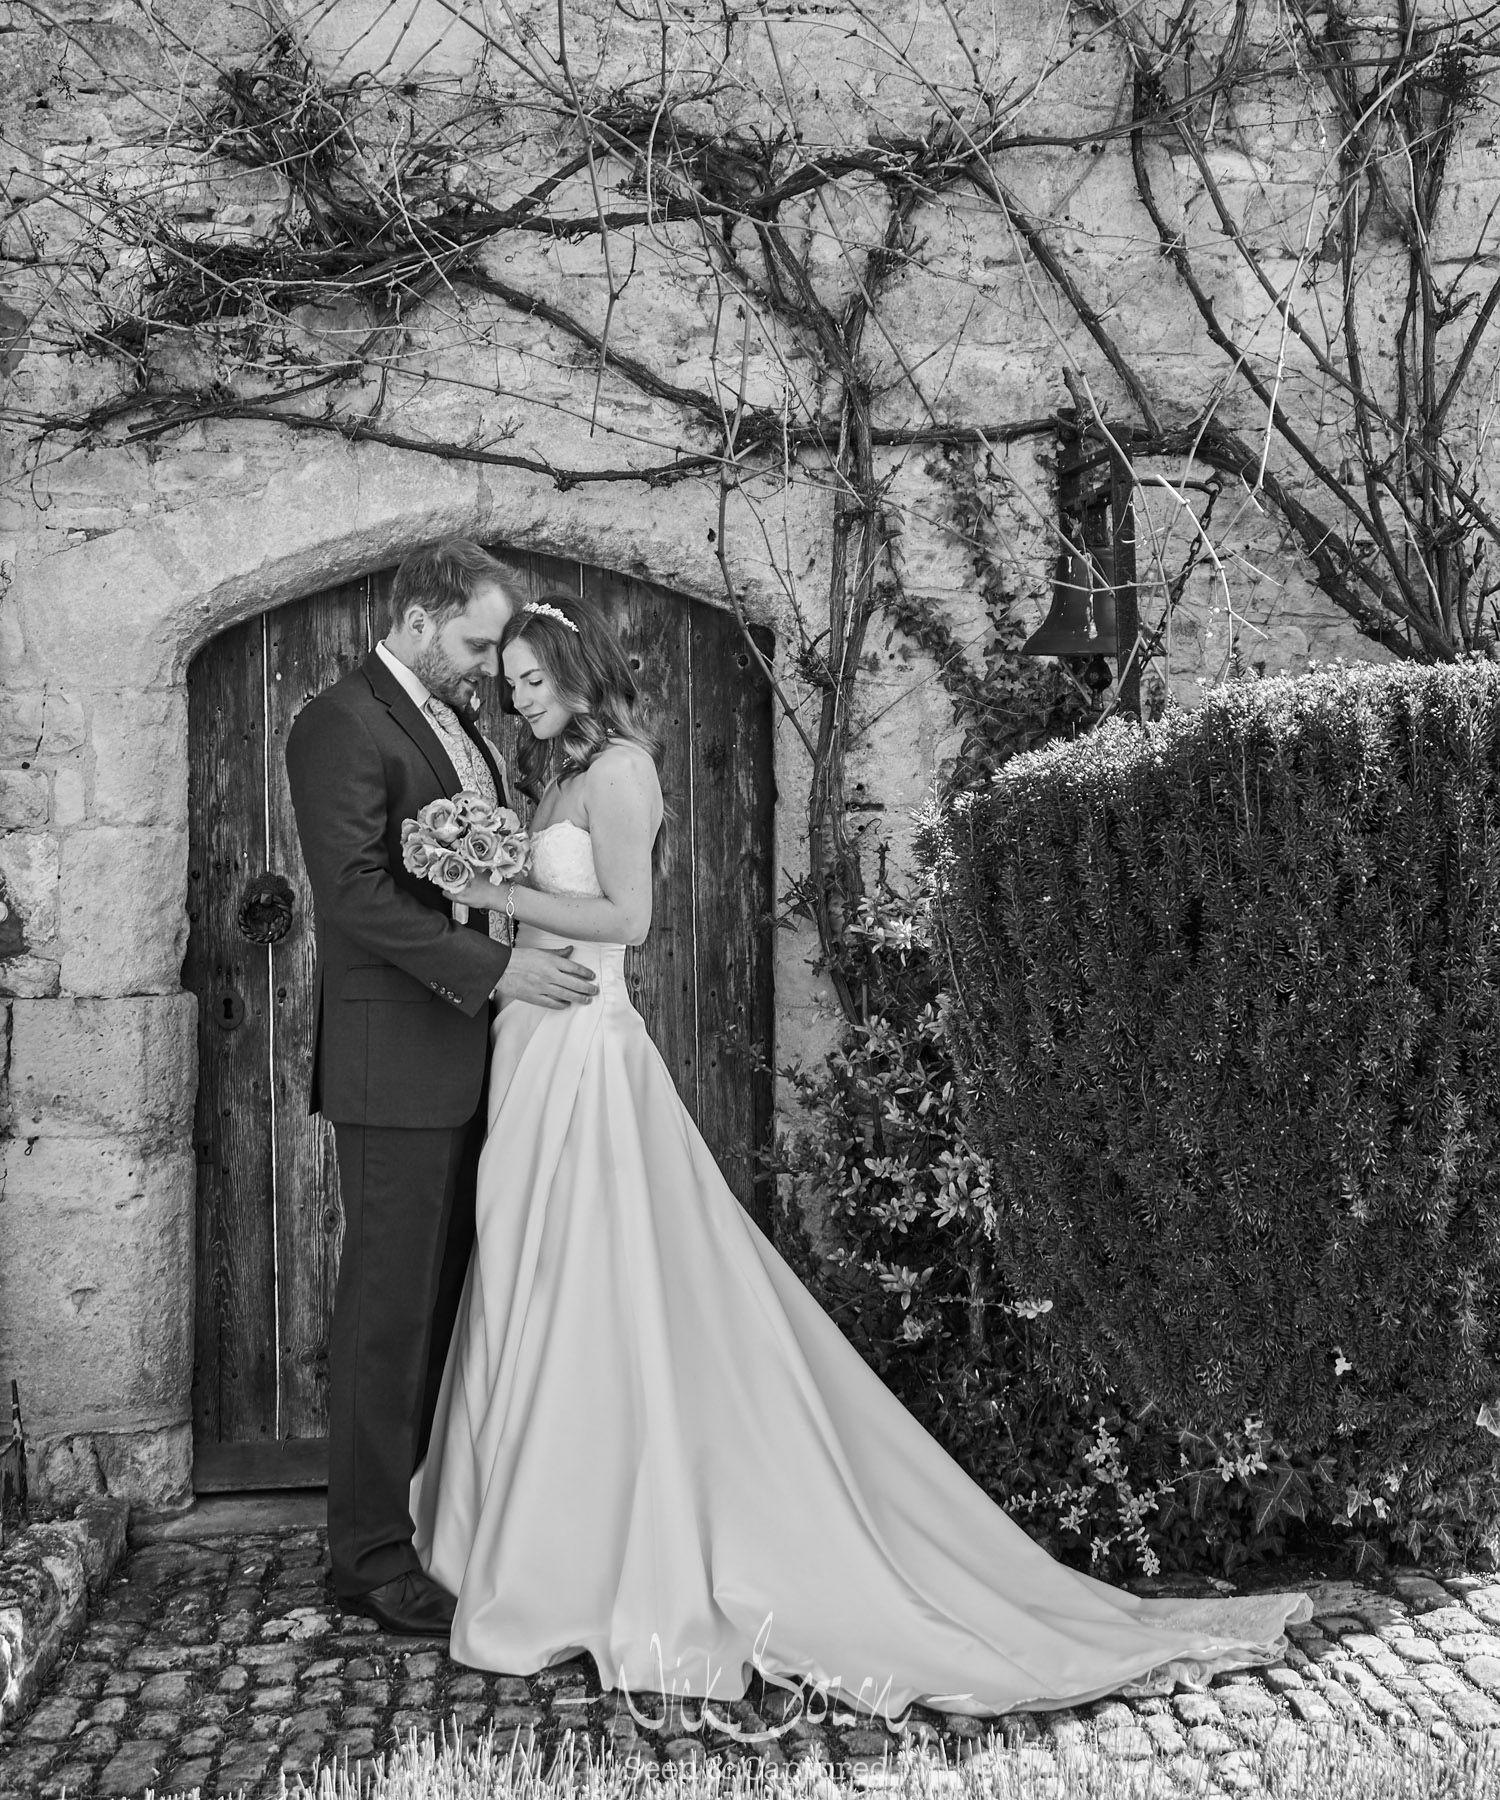 Black & White Wedding Wedding pics, Black white wedding